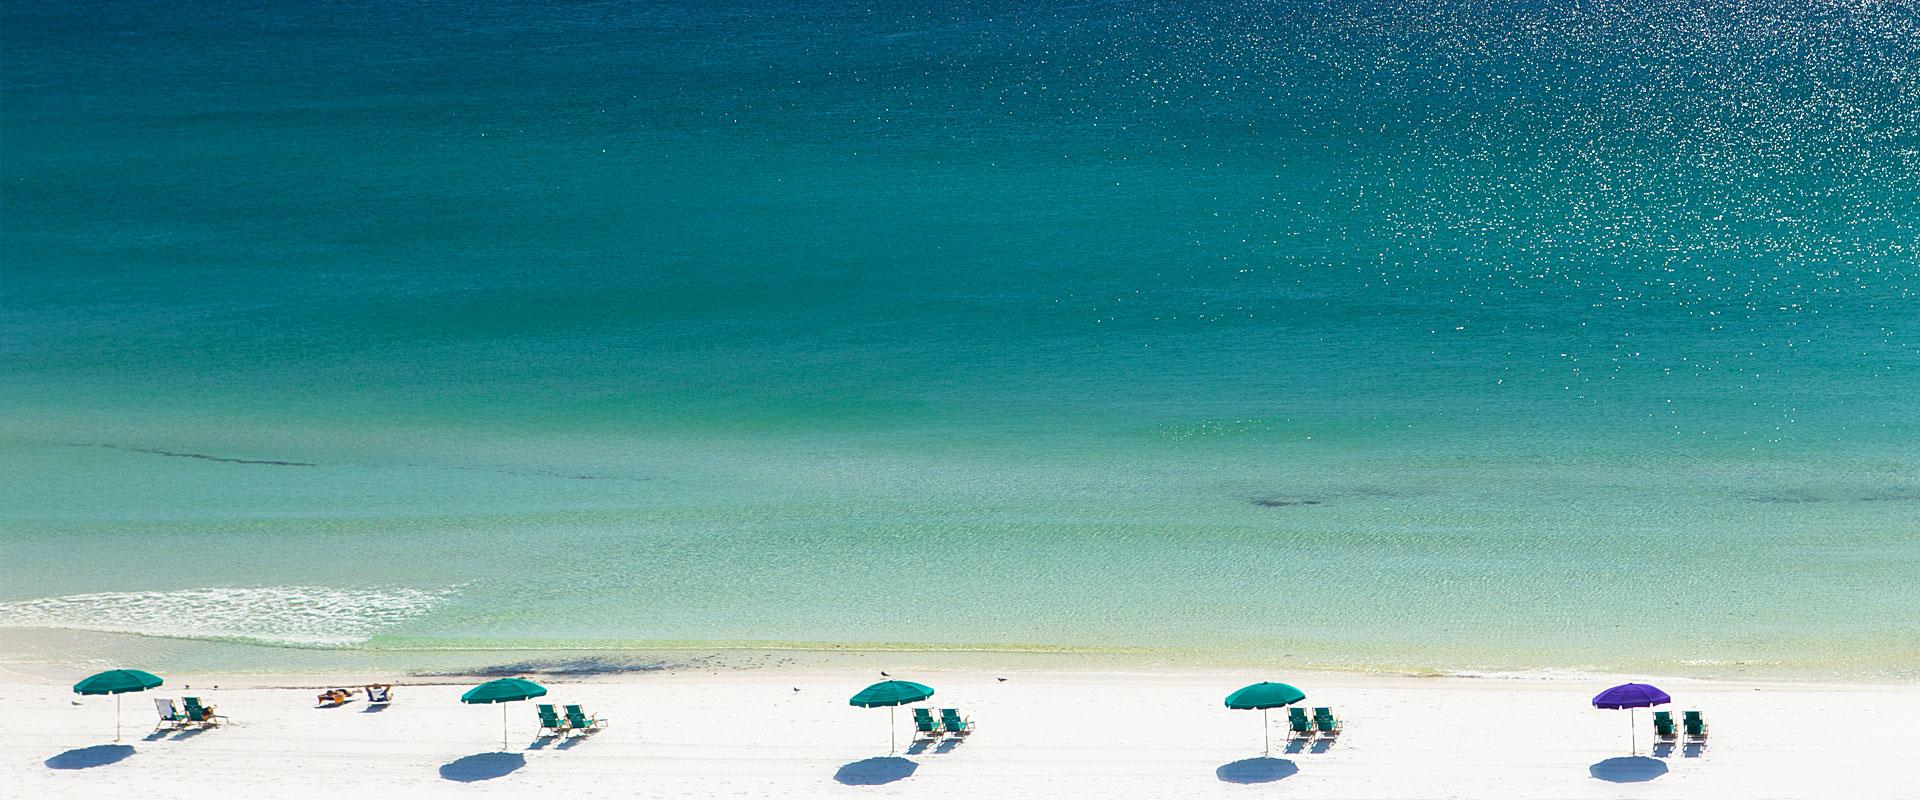 Beach Image #1